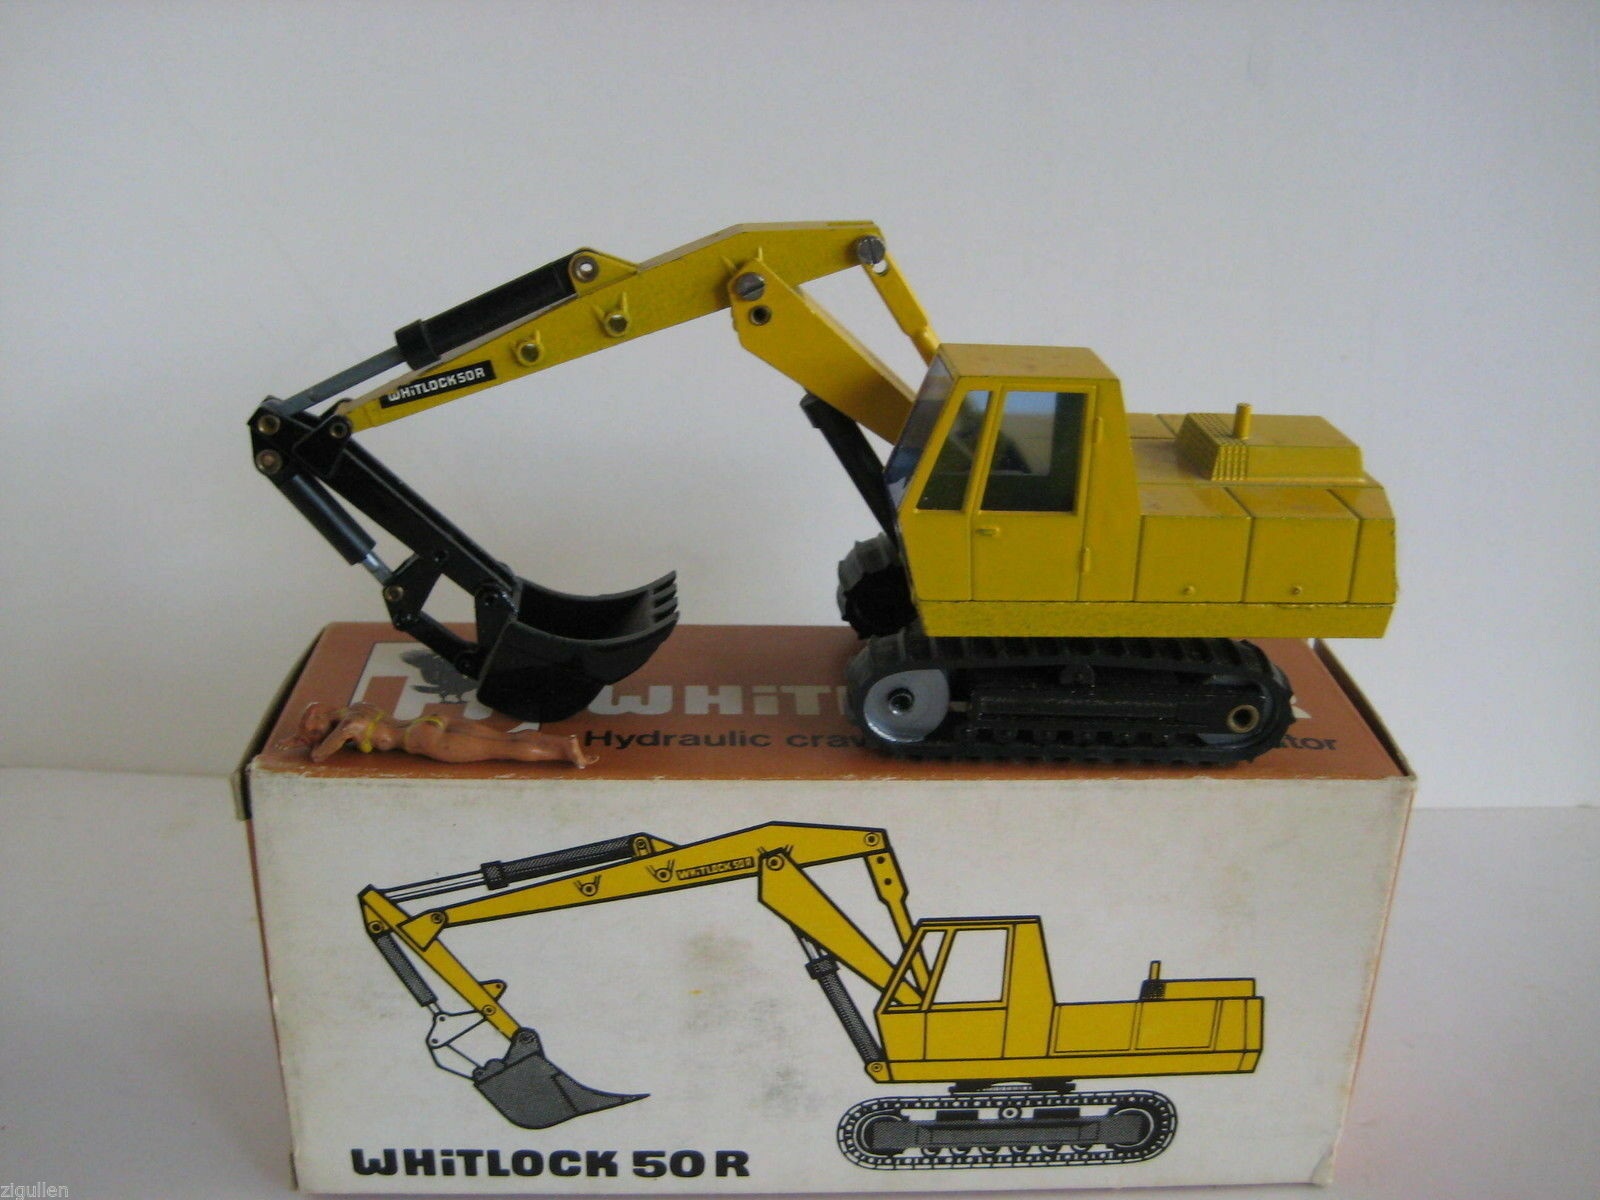 Whitlock 50 R Excavator Bucket Excavator plastikfelgen  110.2c NZG 1 50 pack